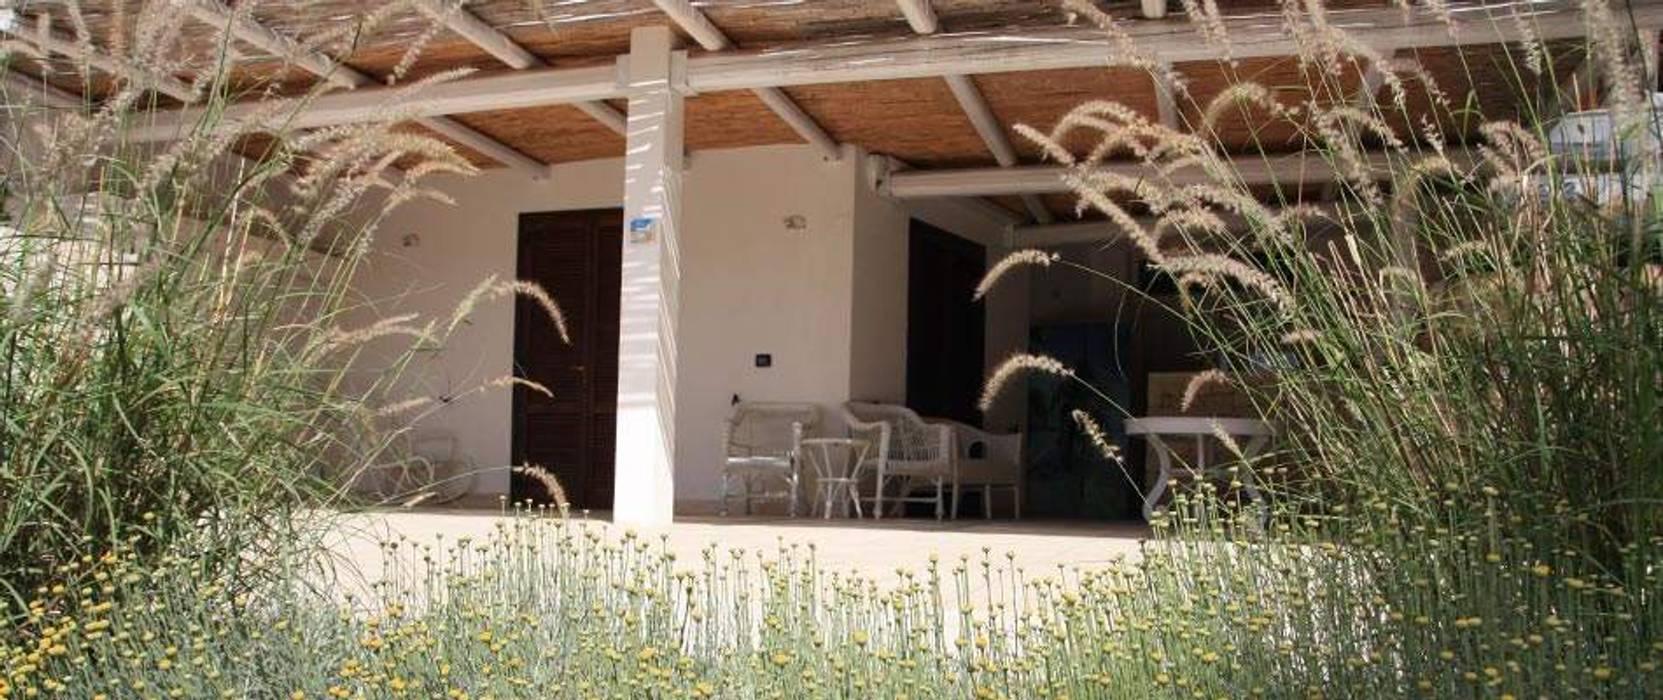 Il giardino dell'otium otragiardini Giardino in stile mediterraneo